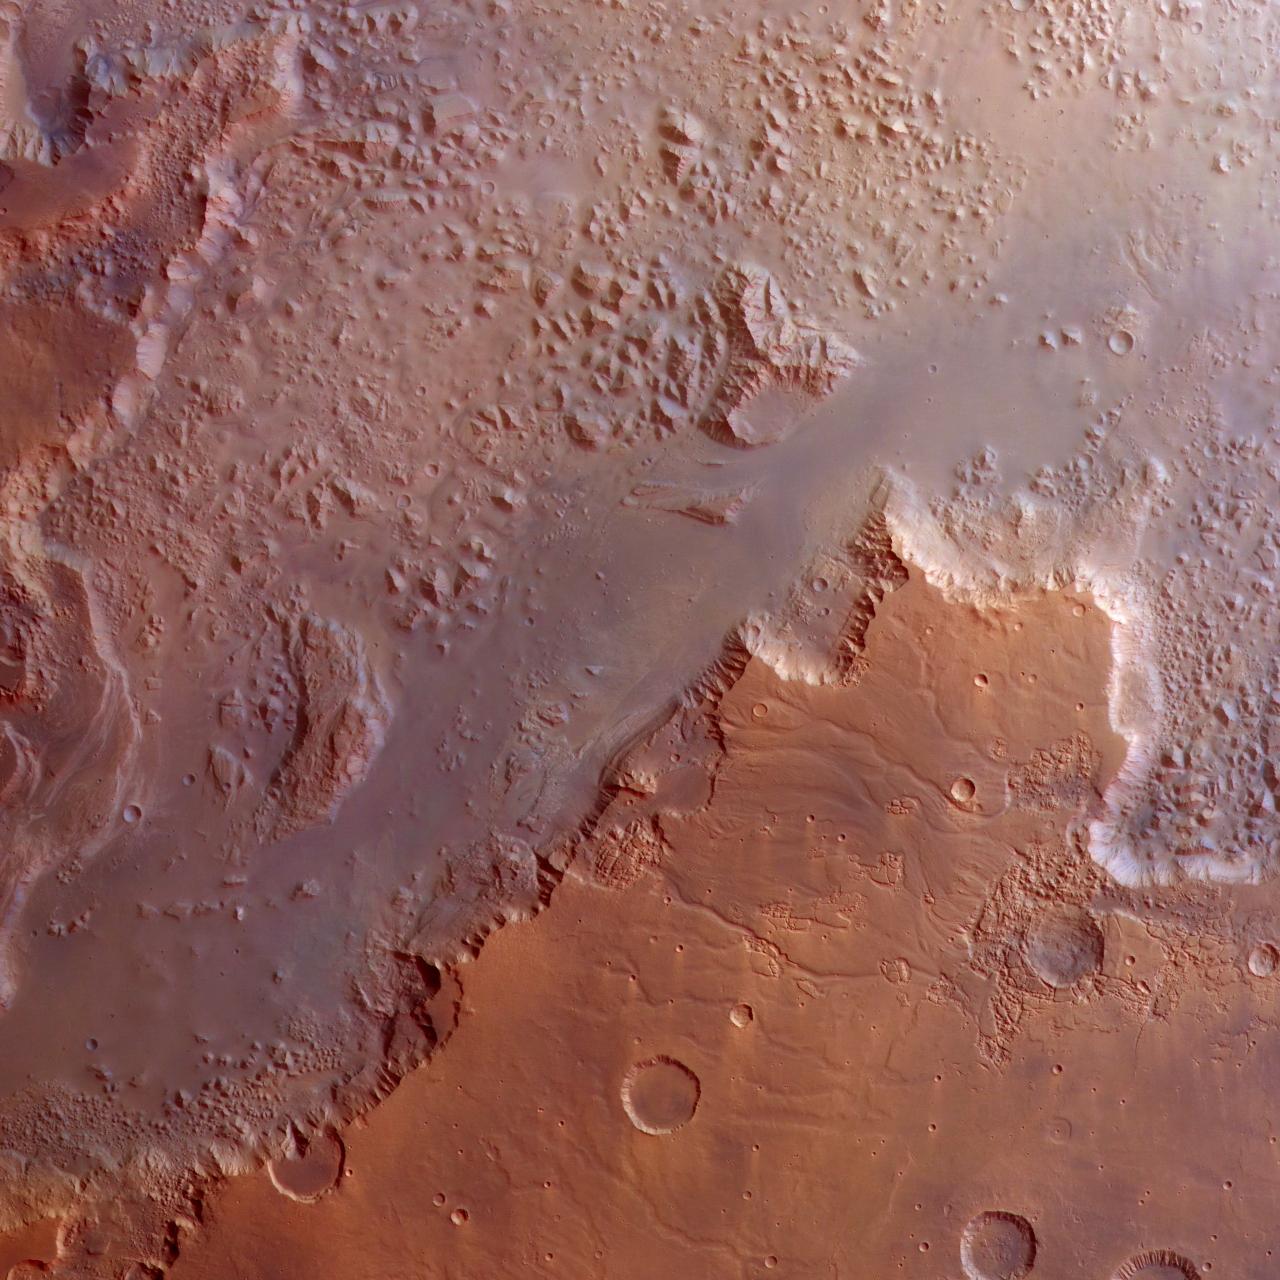 1567218054902-Eos-Chasma-wallpaper.jpg